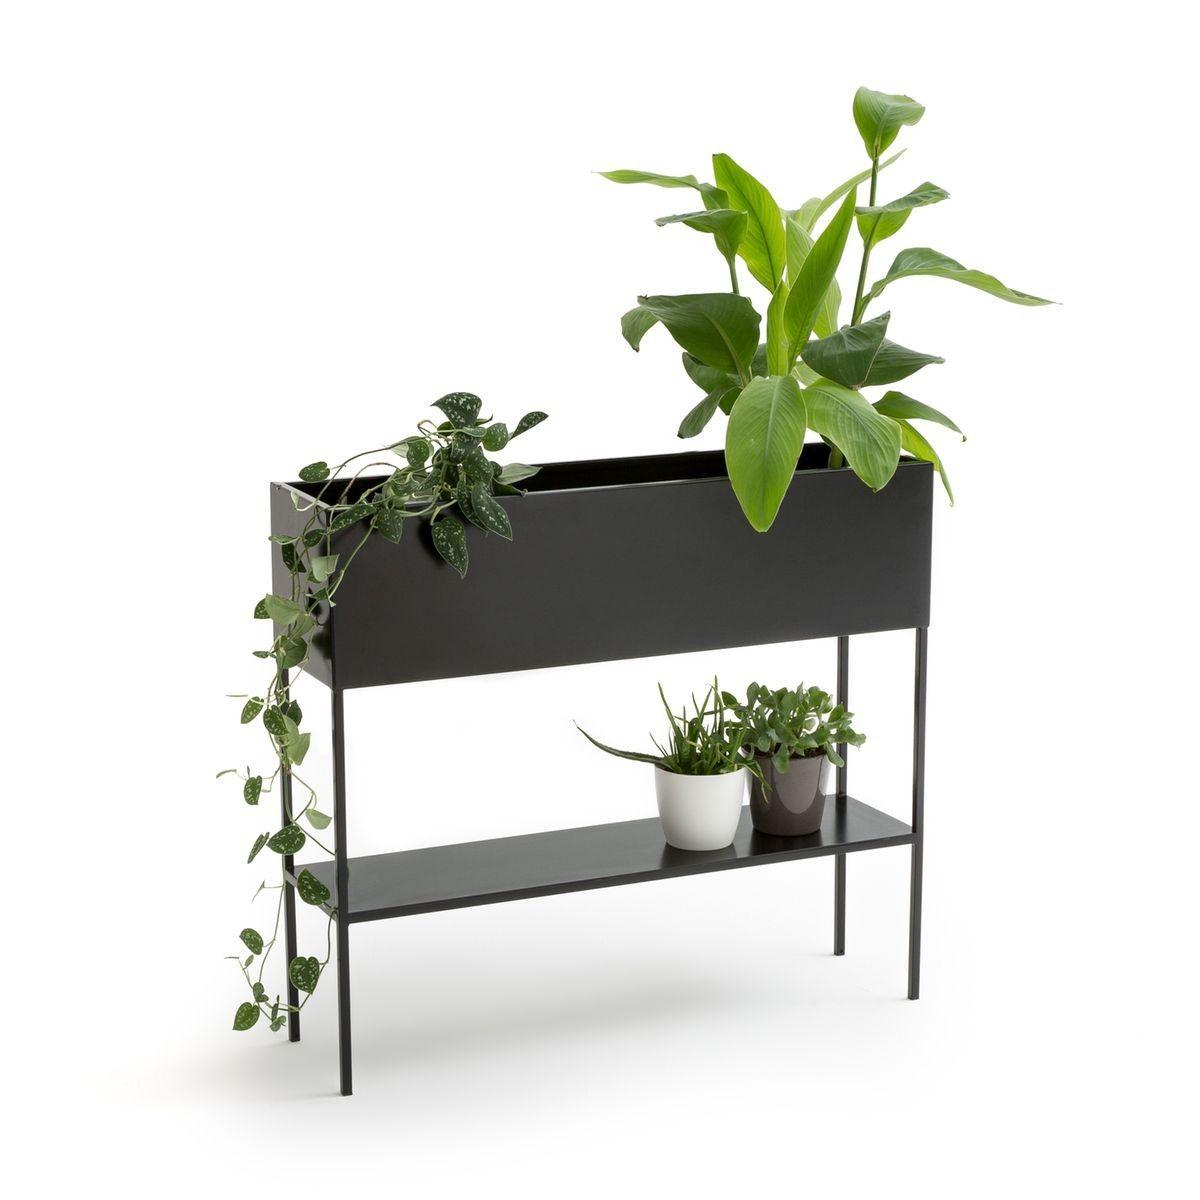 Console Planteur Consuela Jardinieres Metalliques Console Deco